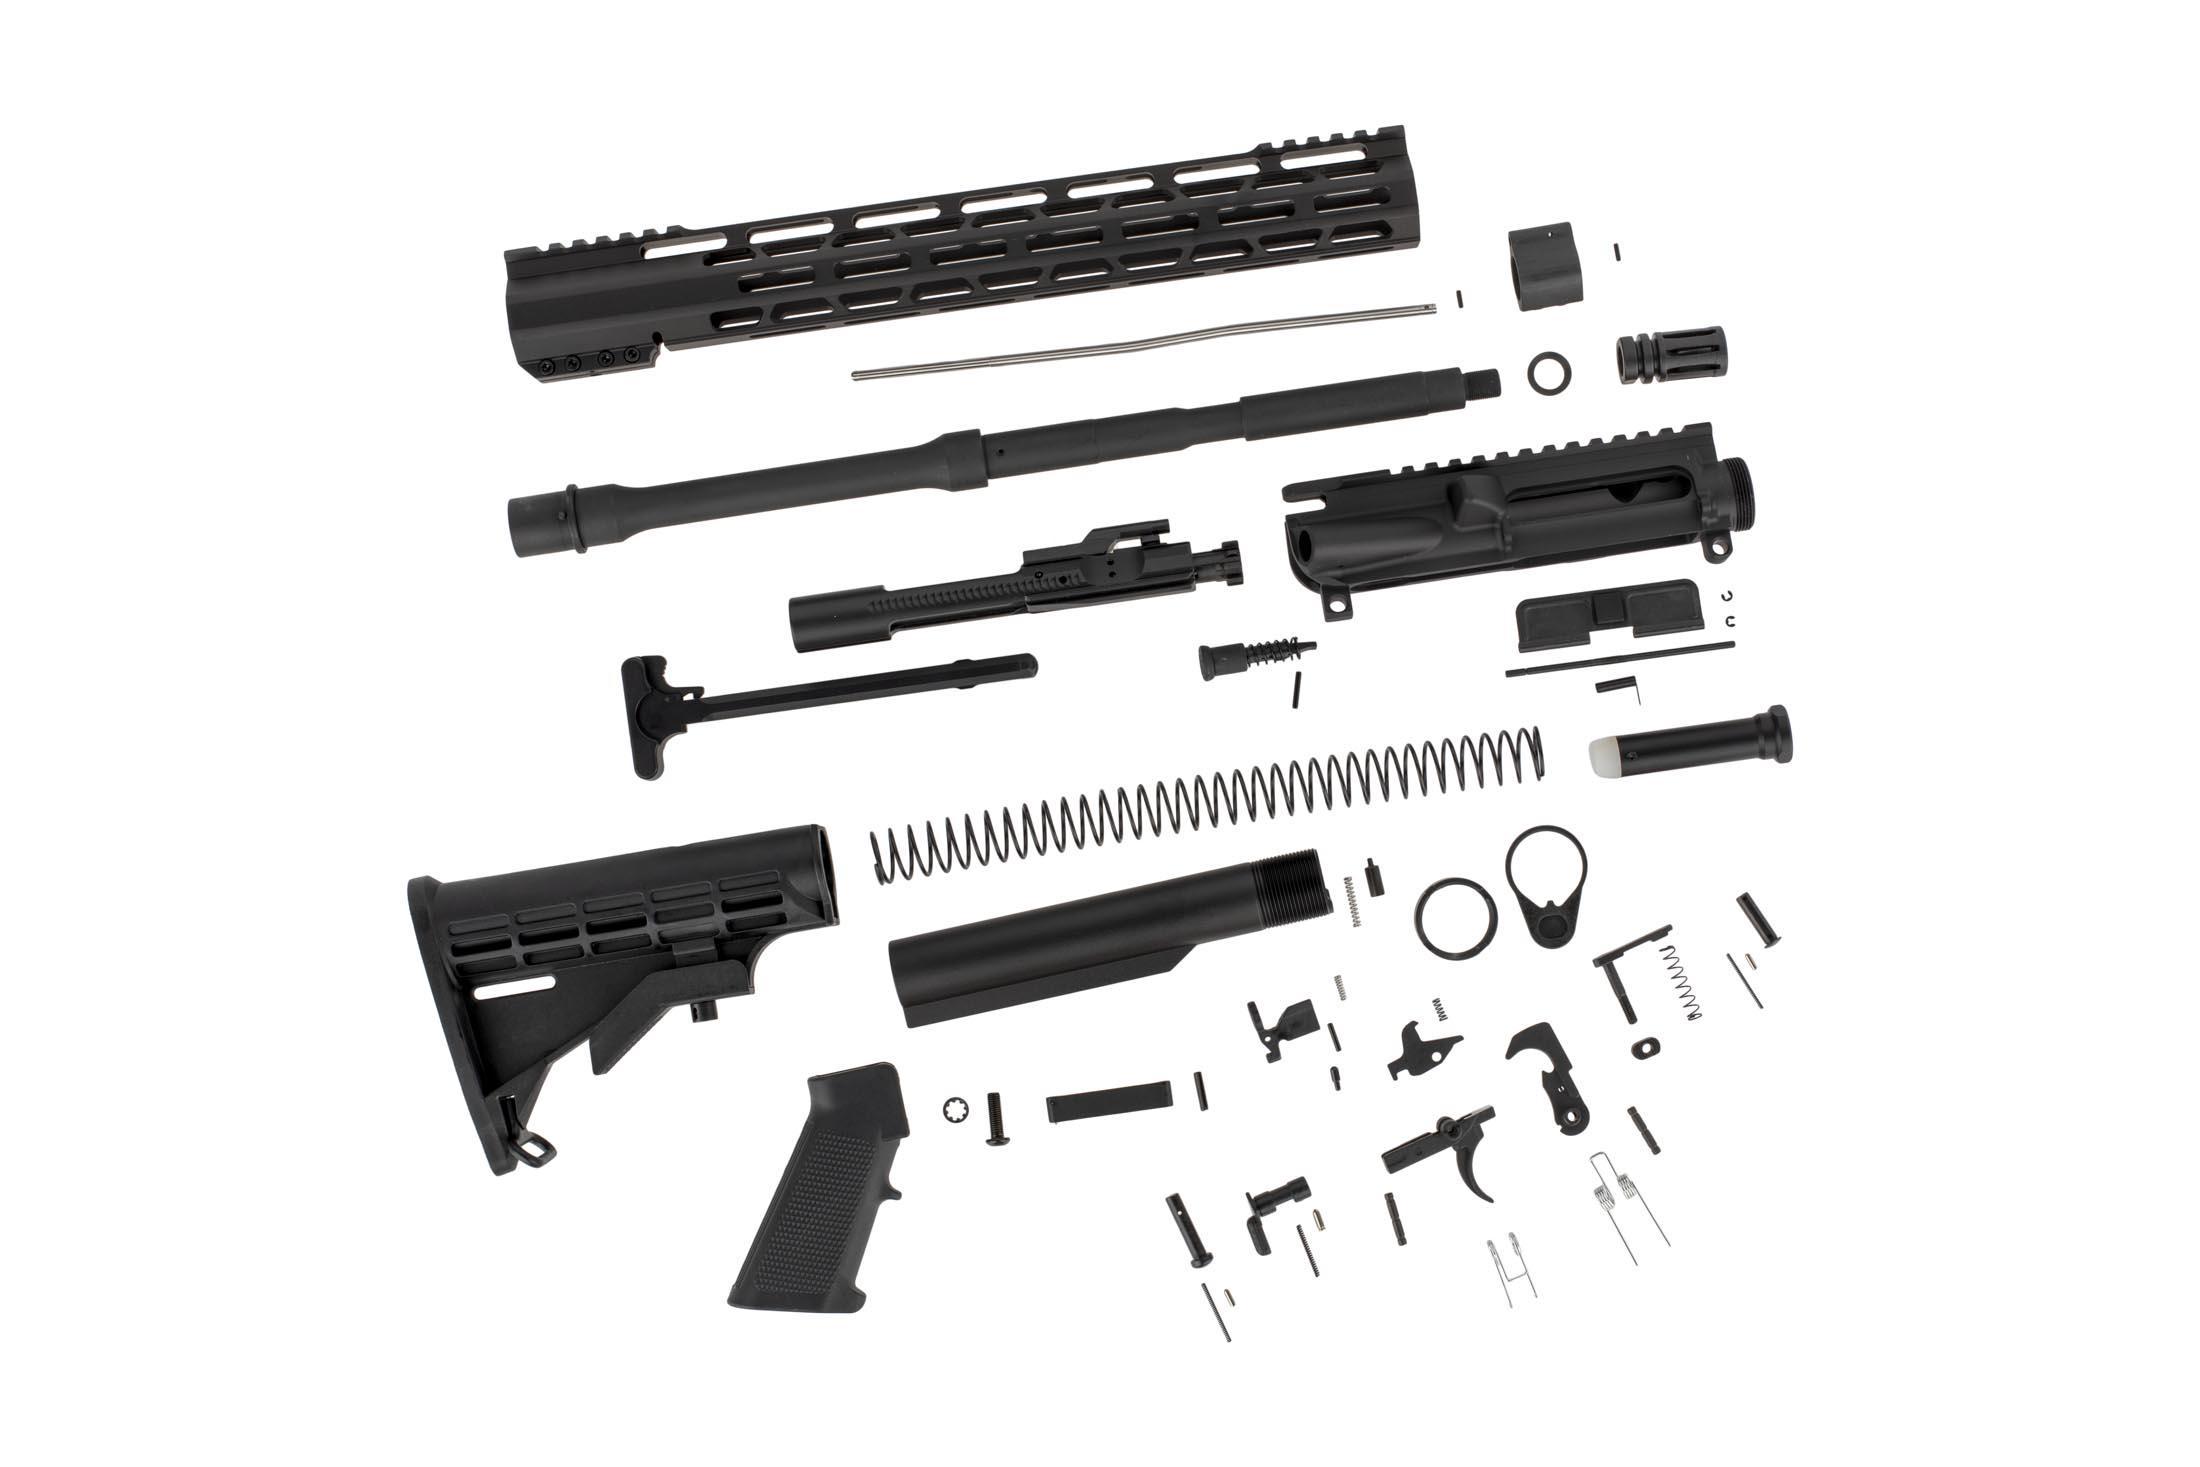 TacFire AR-15 Build Kit Minus Lower - 16